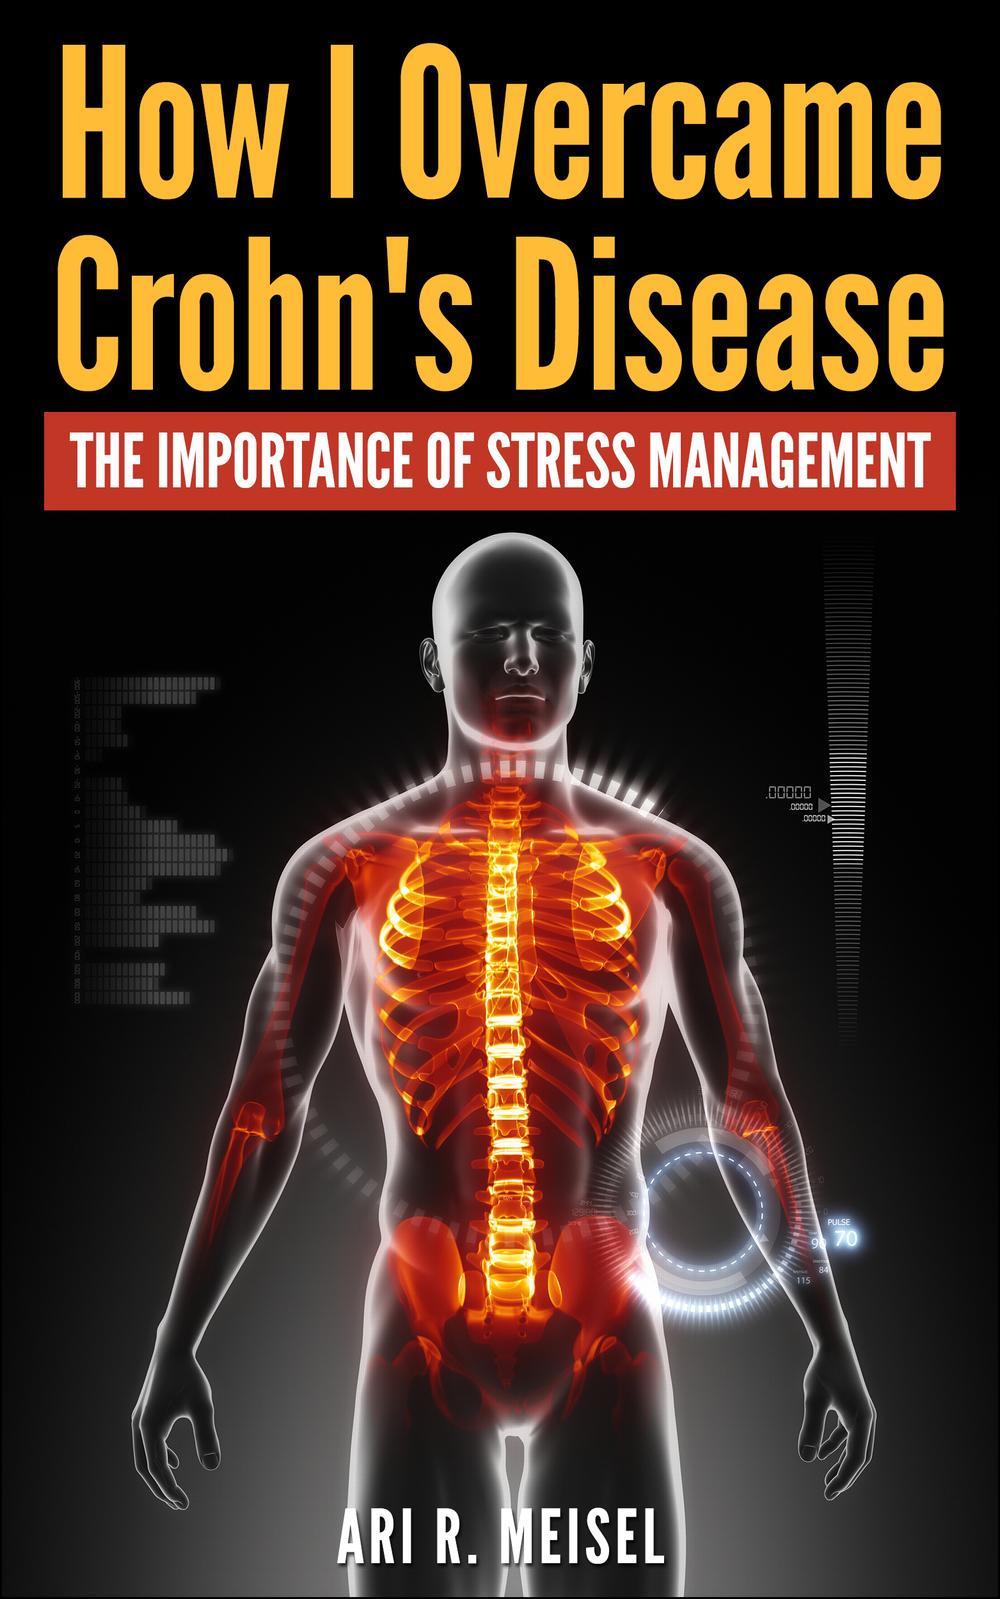 How I Overcame Crohn's Disease